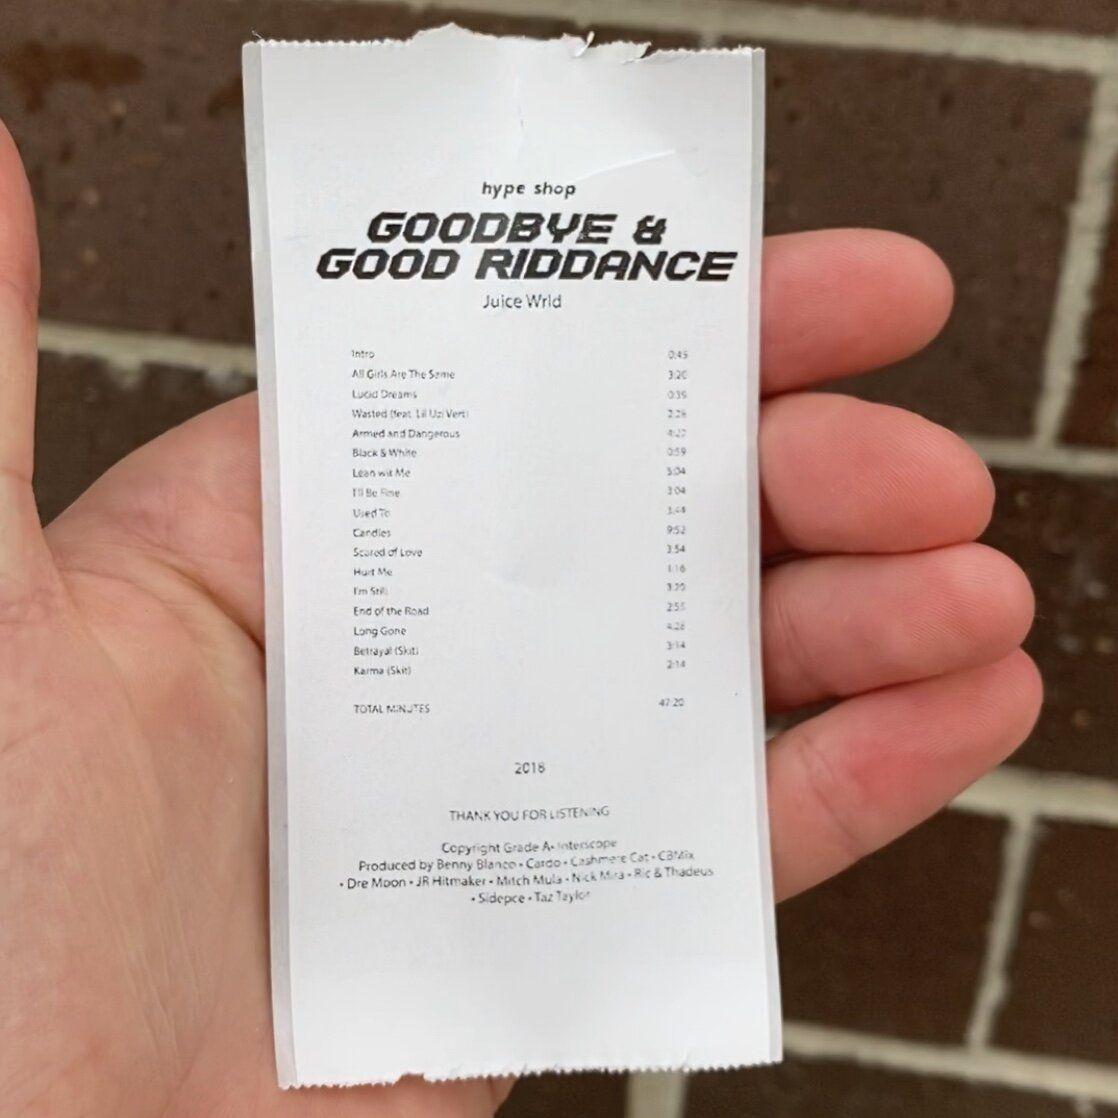 Juice Wrld Goodbye And Good Riddance Album Receipt Sticker Hype Shop Hype Shop Blonde Album Receipt Template